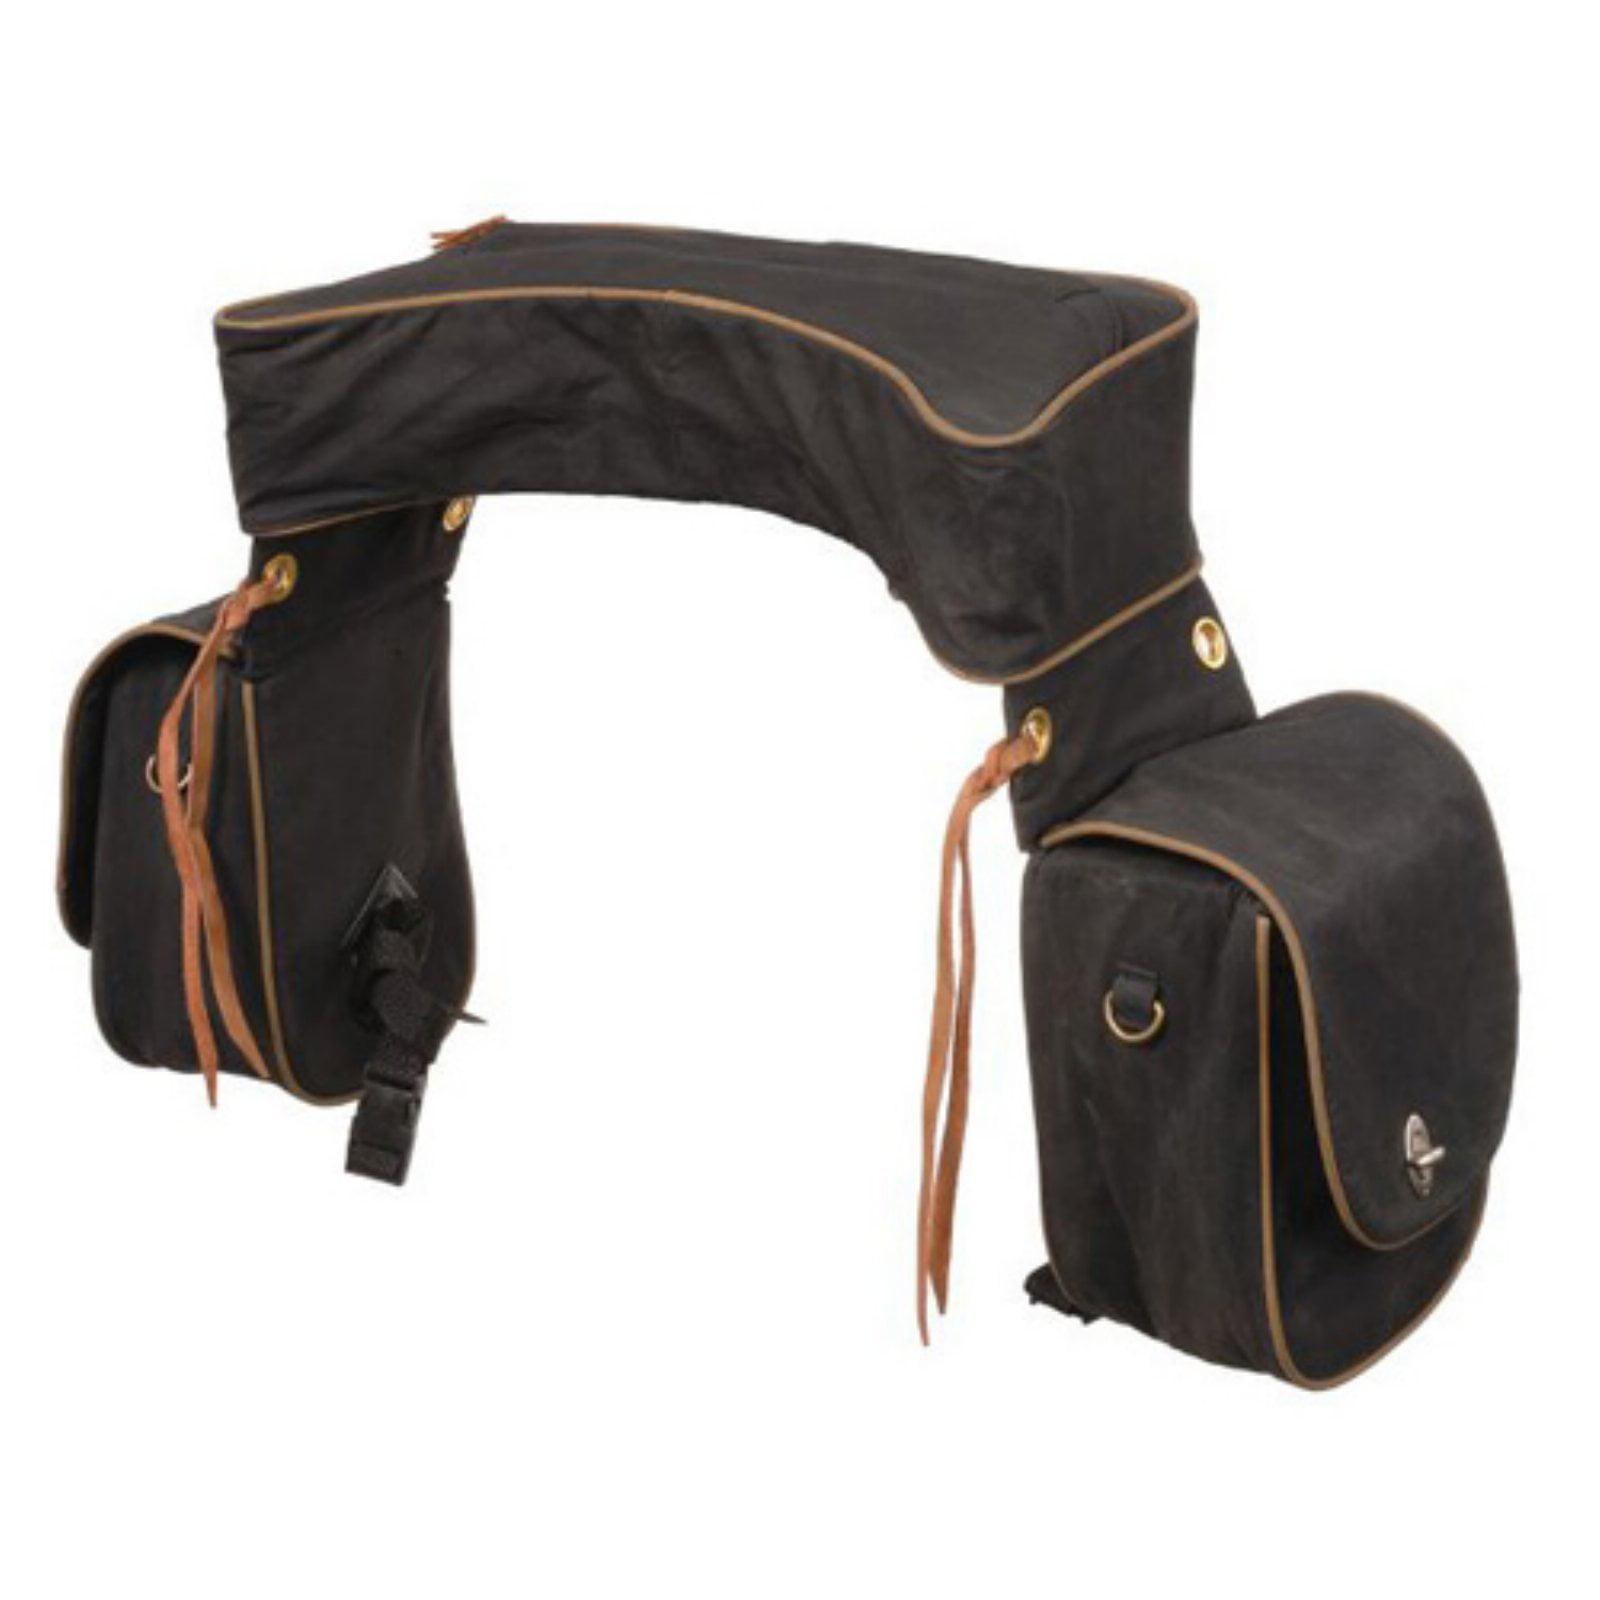 Tough-1 Deluxe Trail Saddle Bag